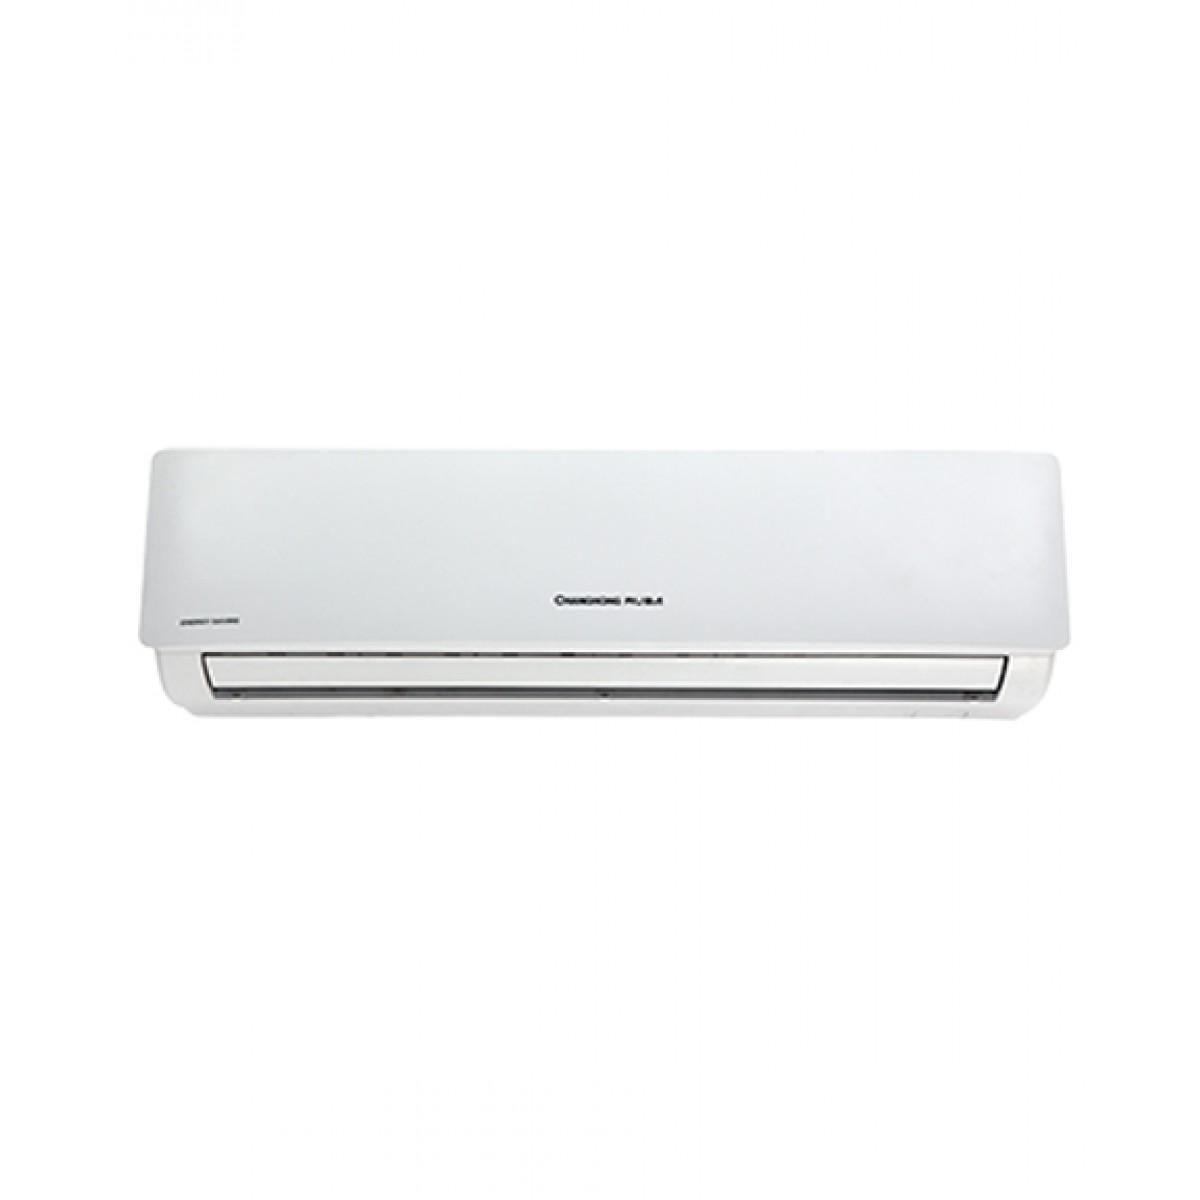 Air Conditioners CHANGHONG RUBA SPLIT AIR CONDITIONER 1.5 TON (CSC #6A6661